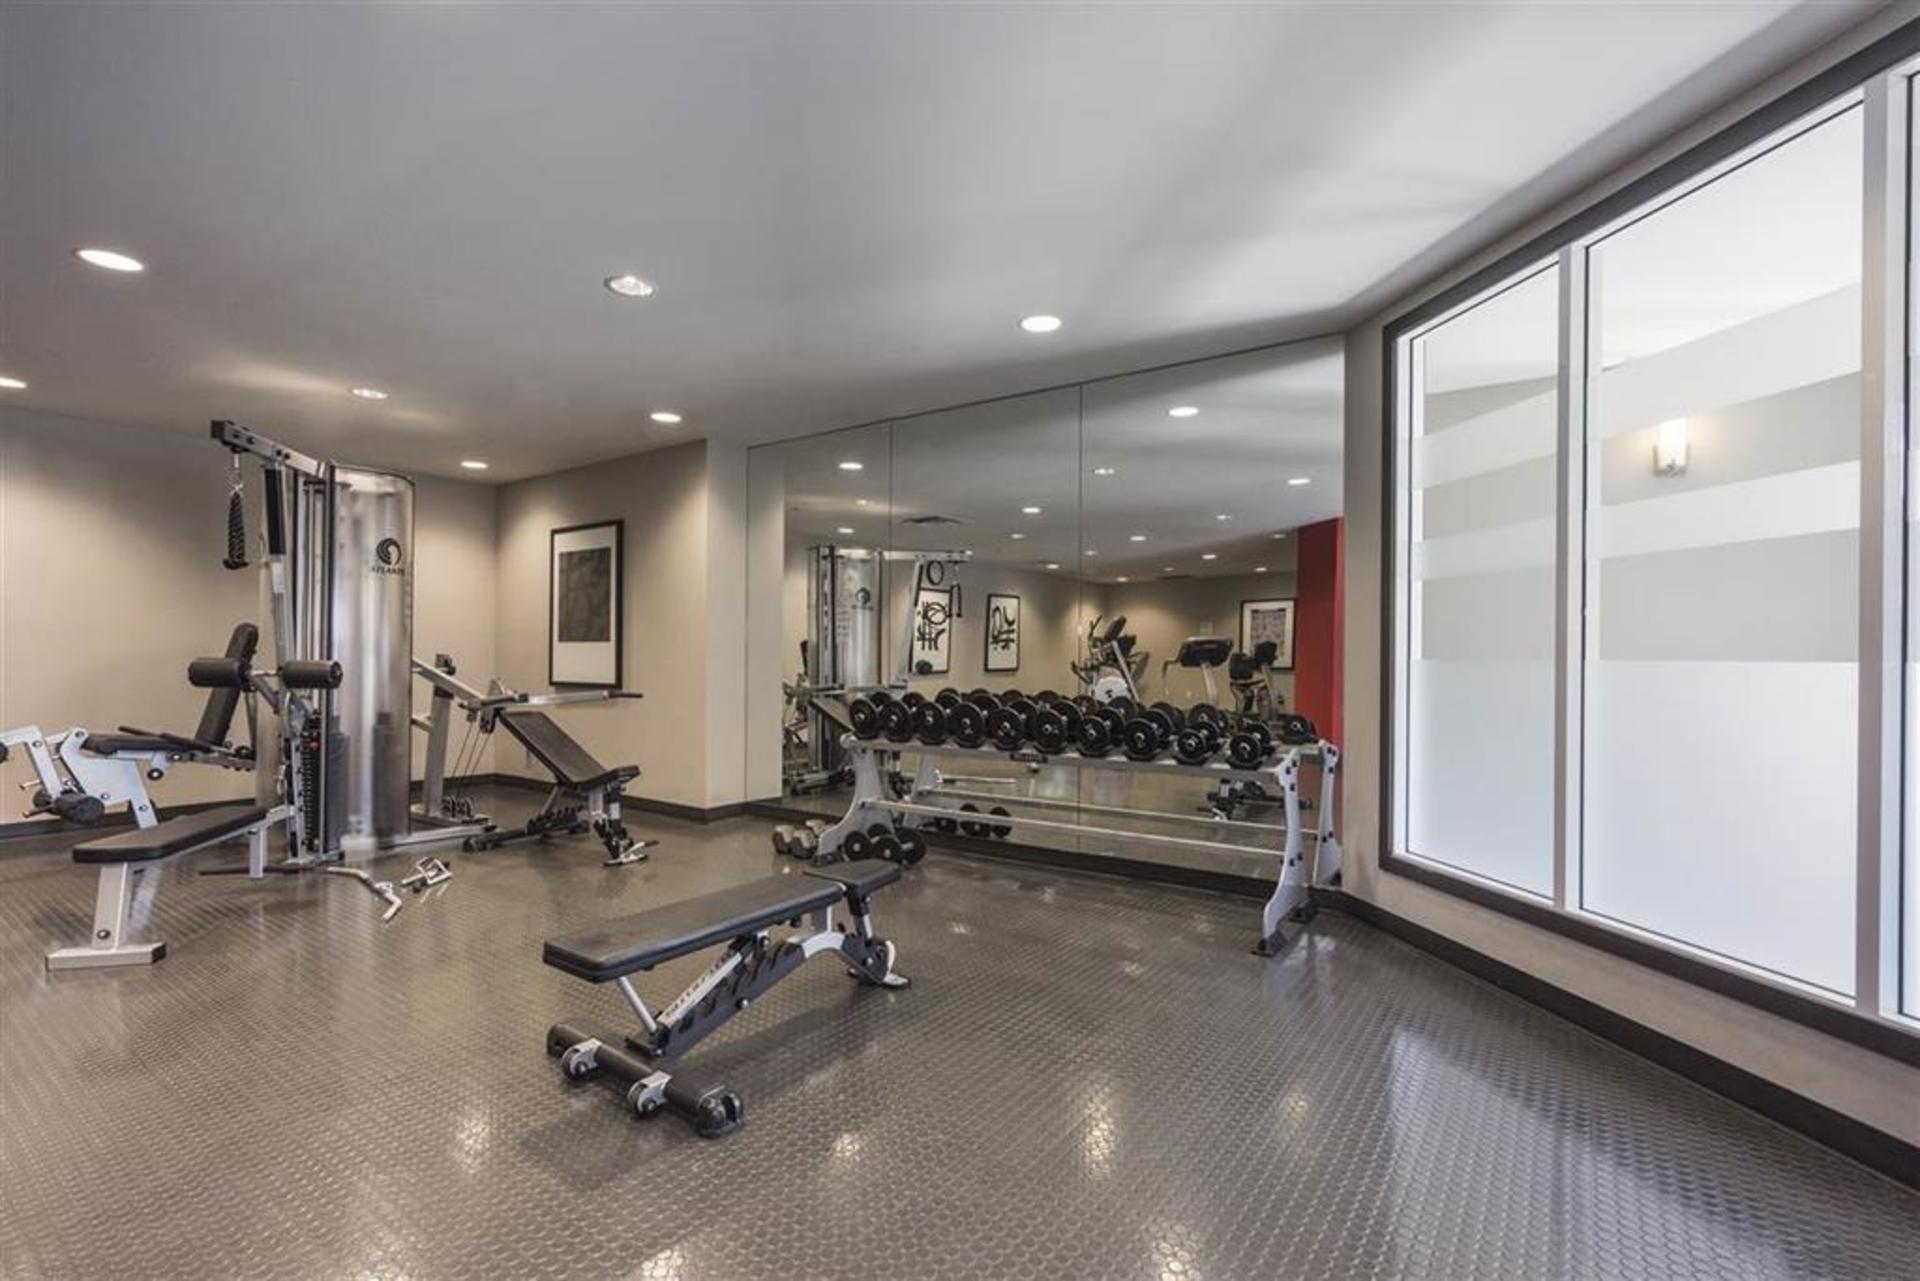 Gym at 151 - 2950 King George Boulevard, King George Corridor, South Surrey White Rock